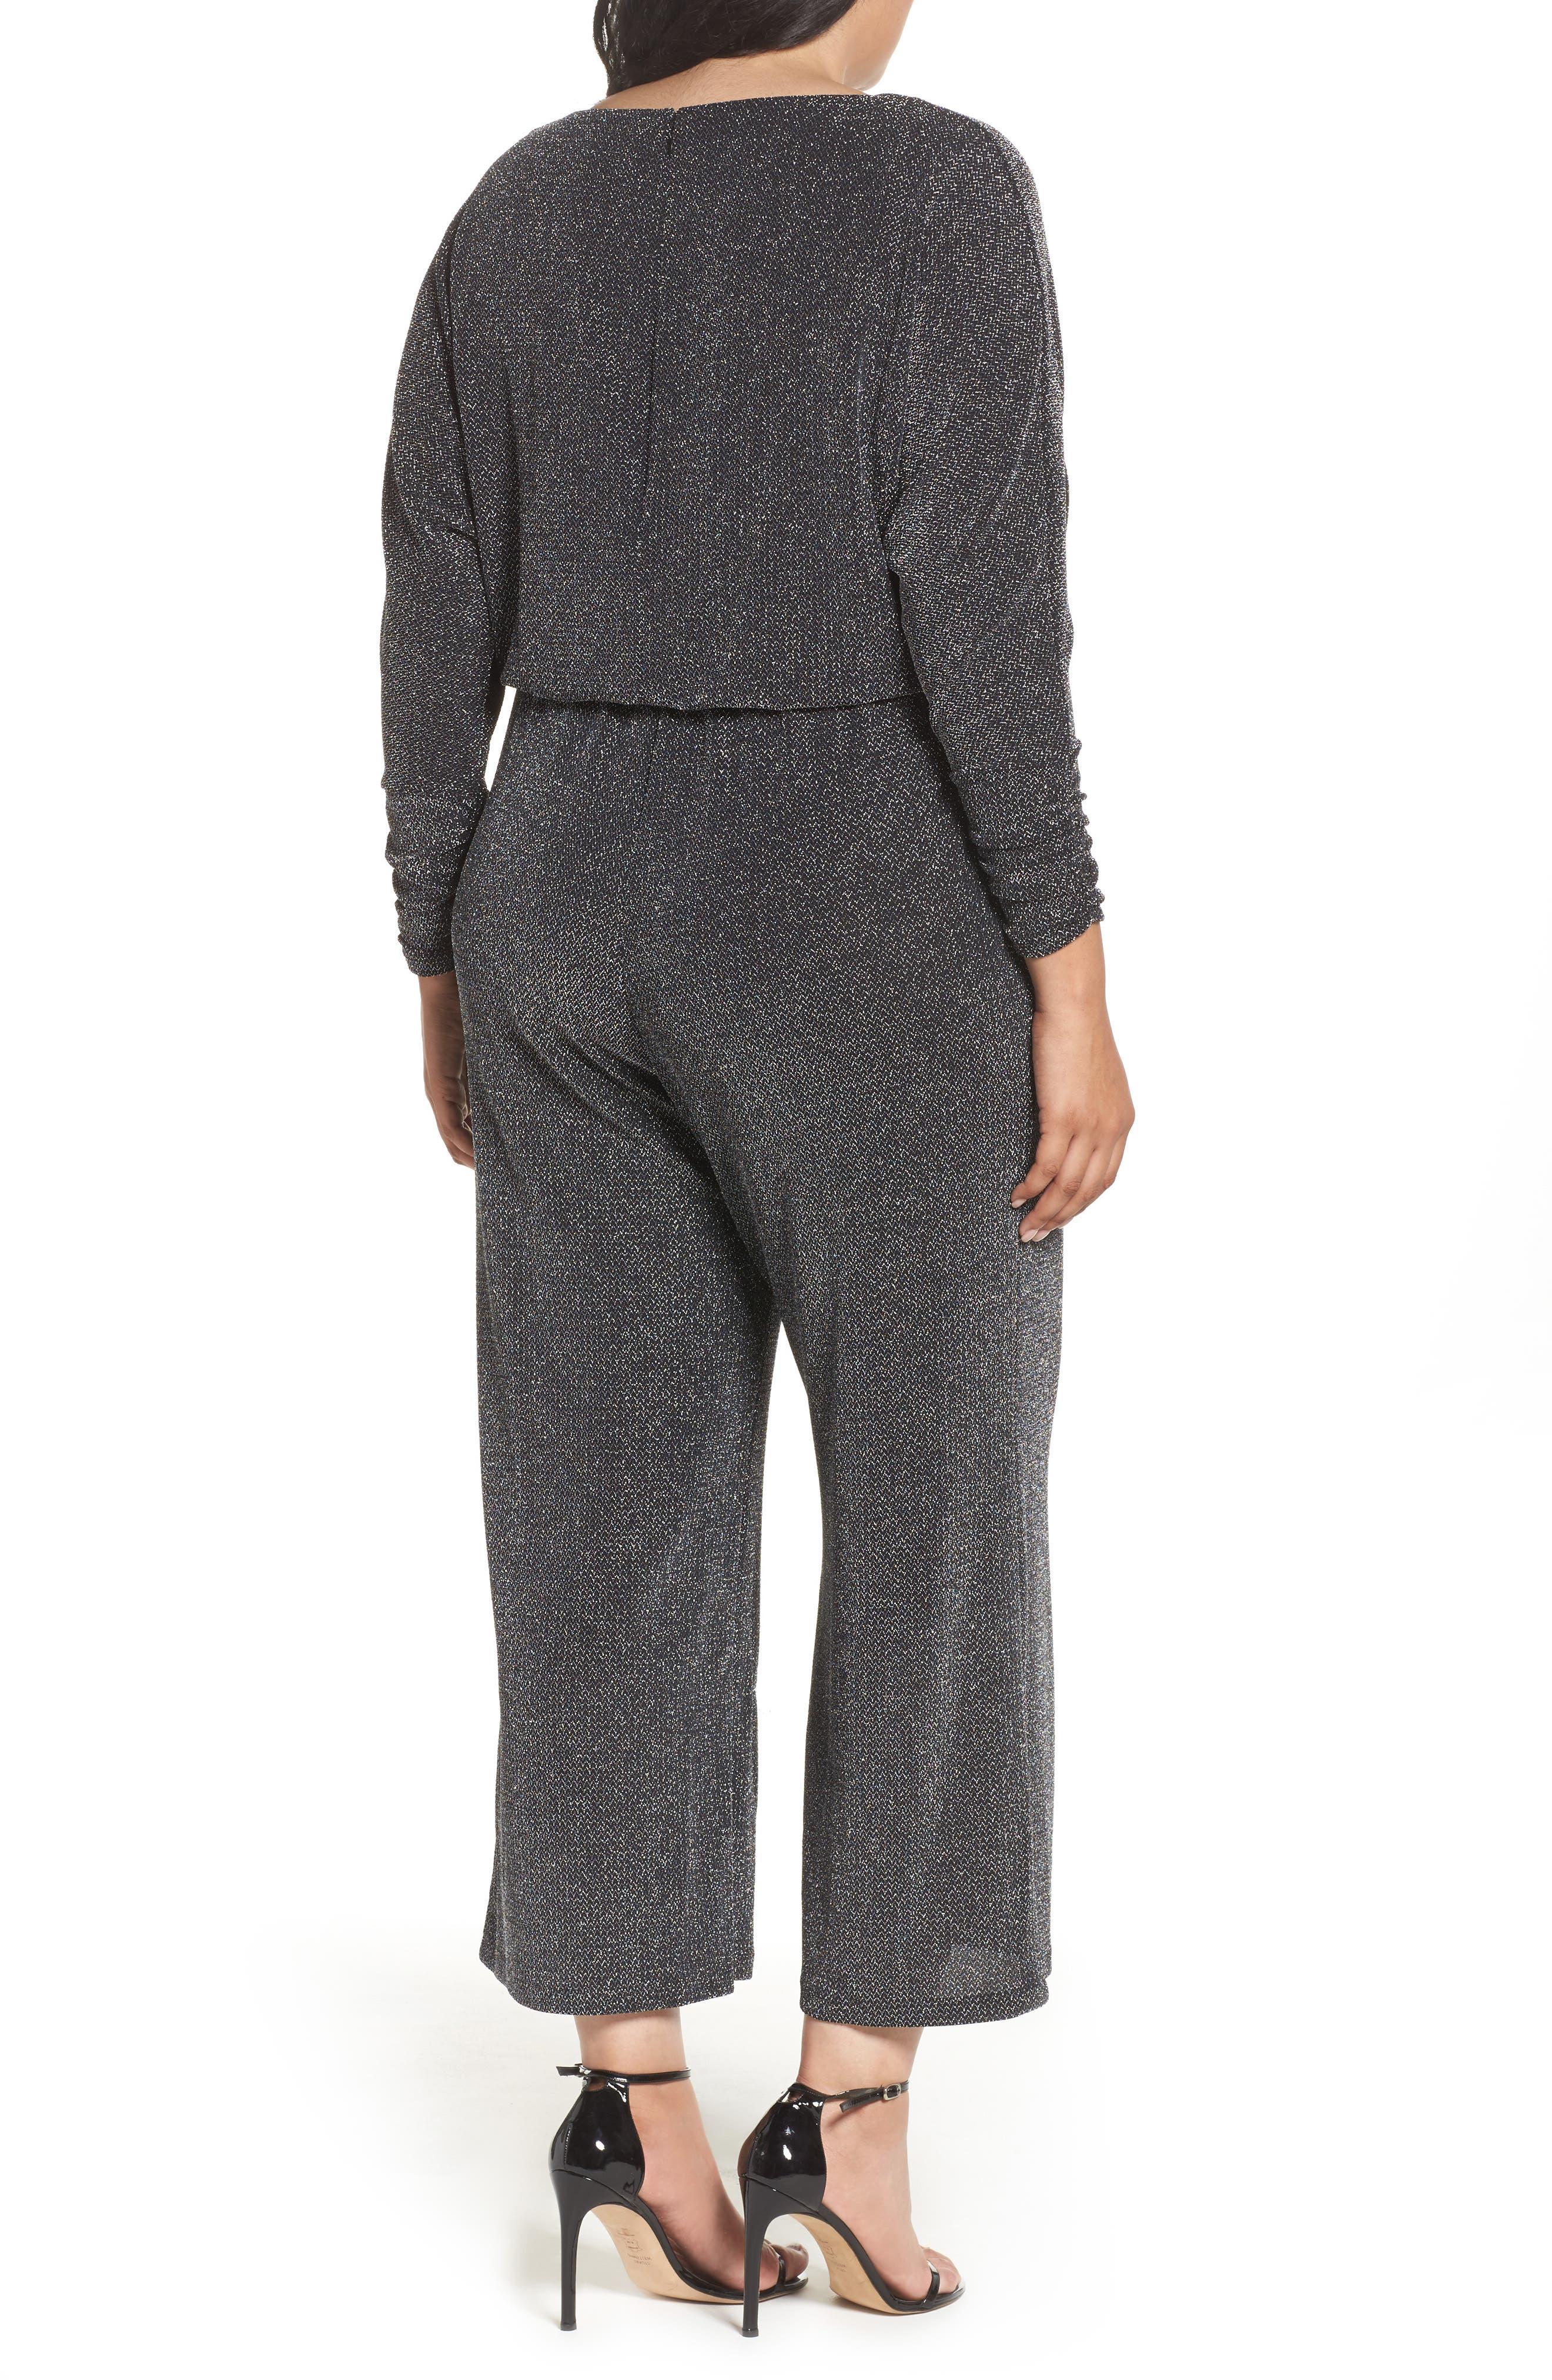 Metallic Knit Jumpsuit,                             Alternate thumbnail 2, color,                             Black/ Silver